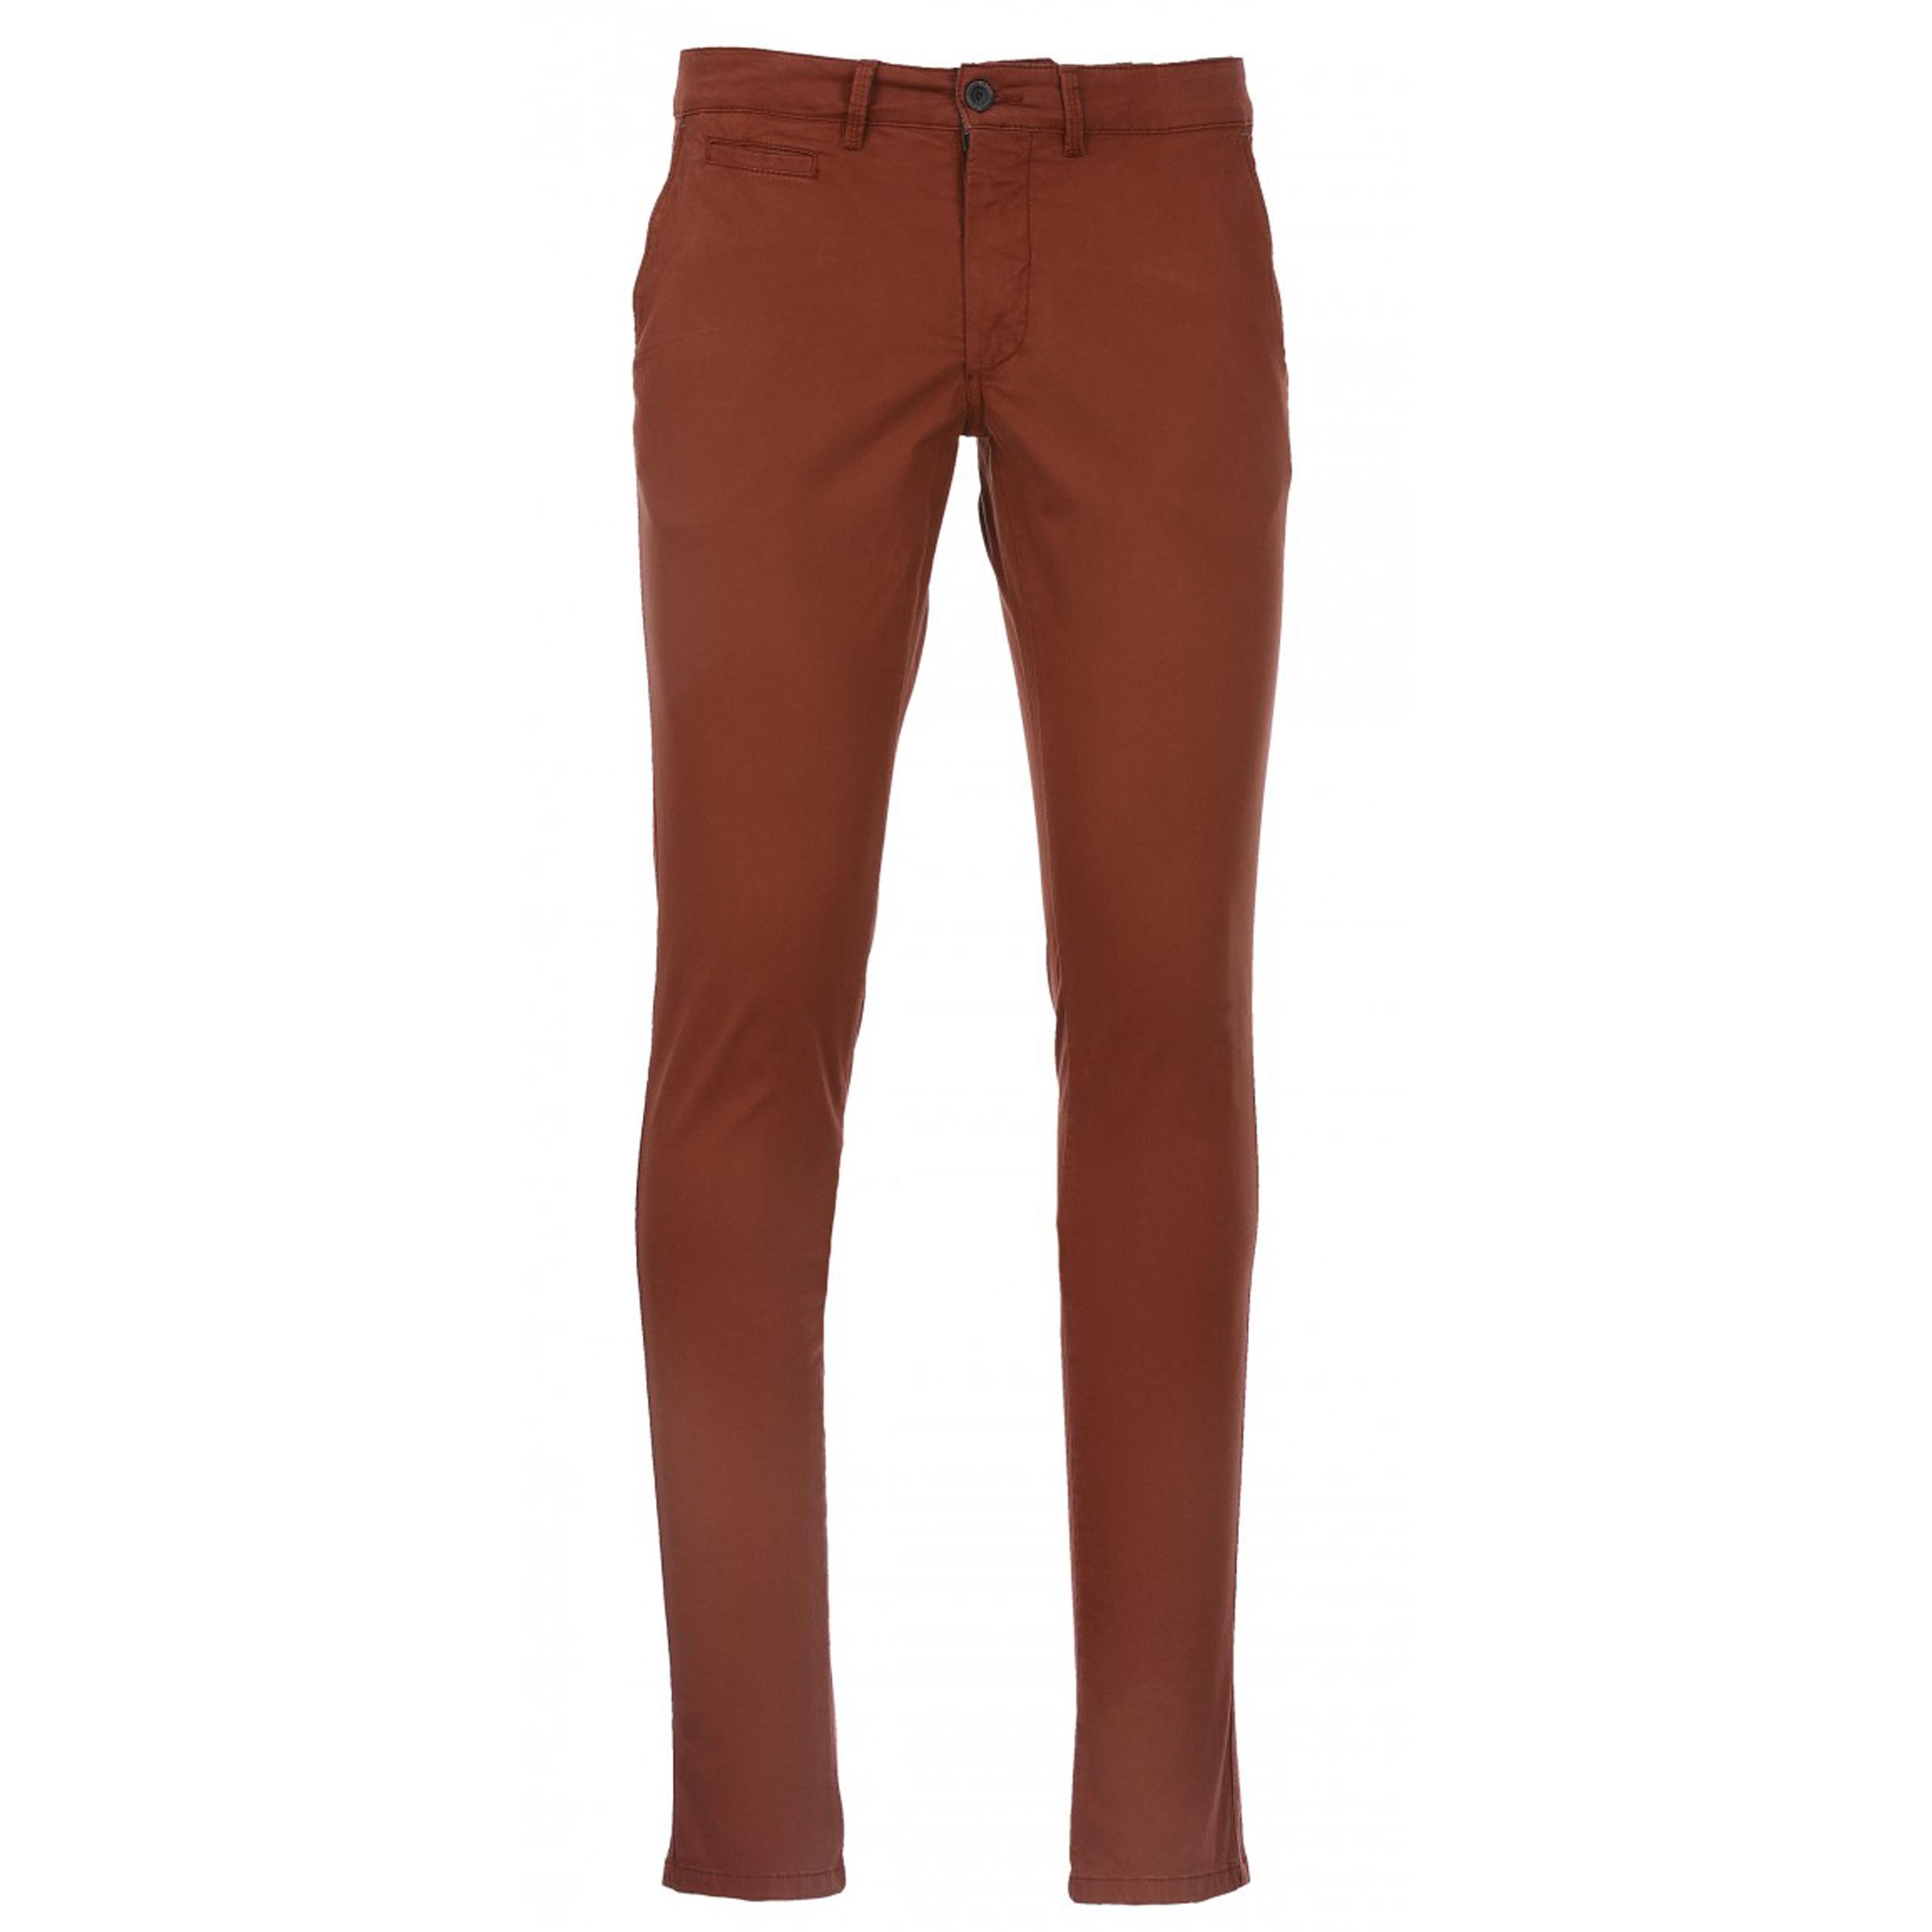 Pantalon chino Delahaye en coton stretch rouge brique